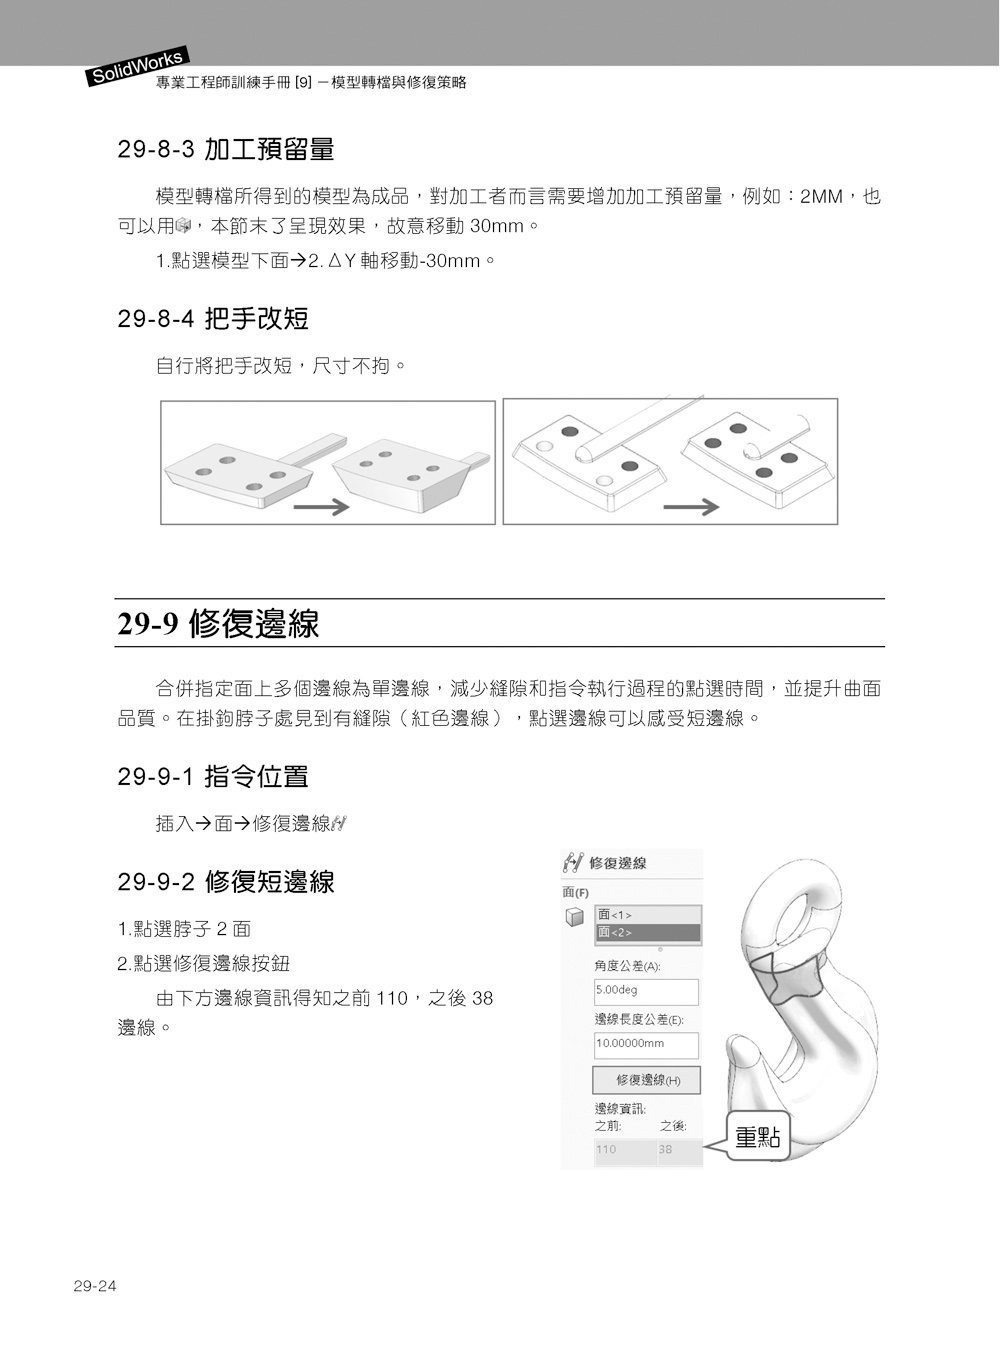 Solidworks 專業工程師訓練手冊[9]-模型轉檔與修復策略-preview-27